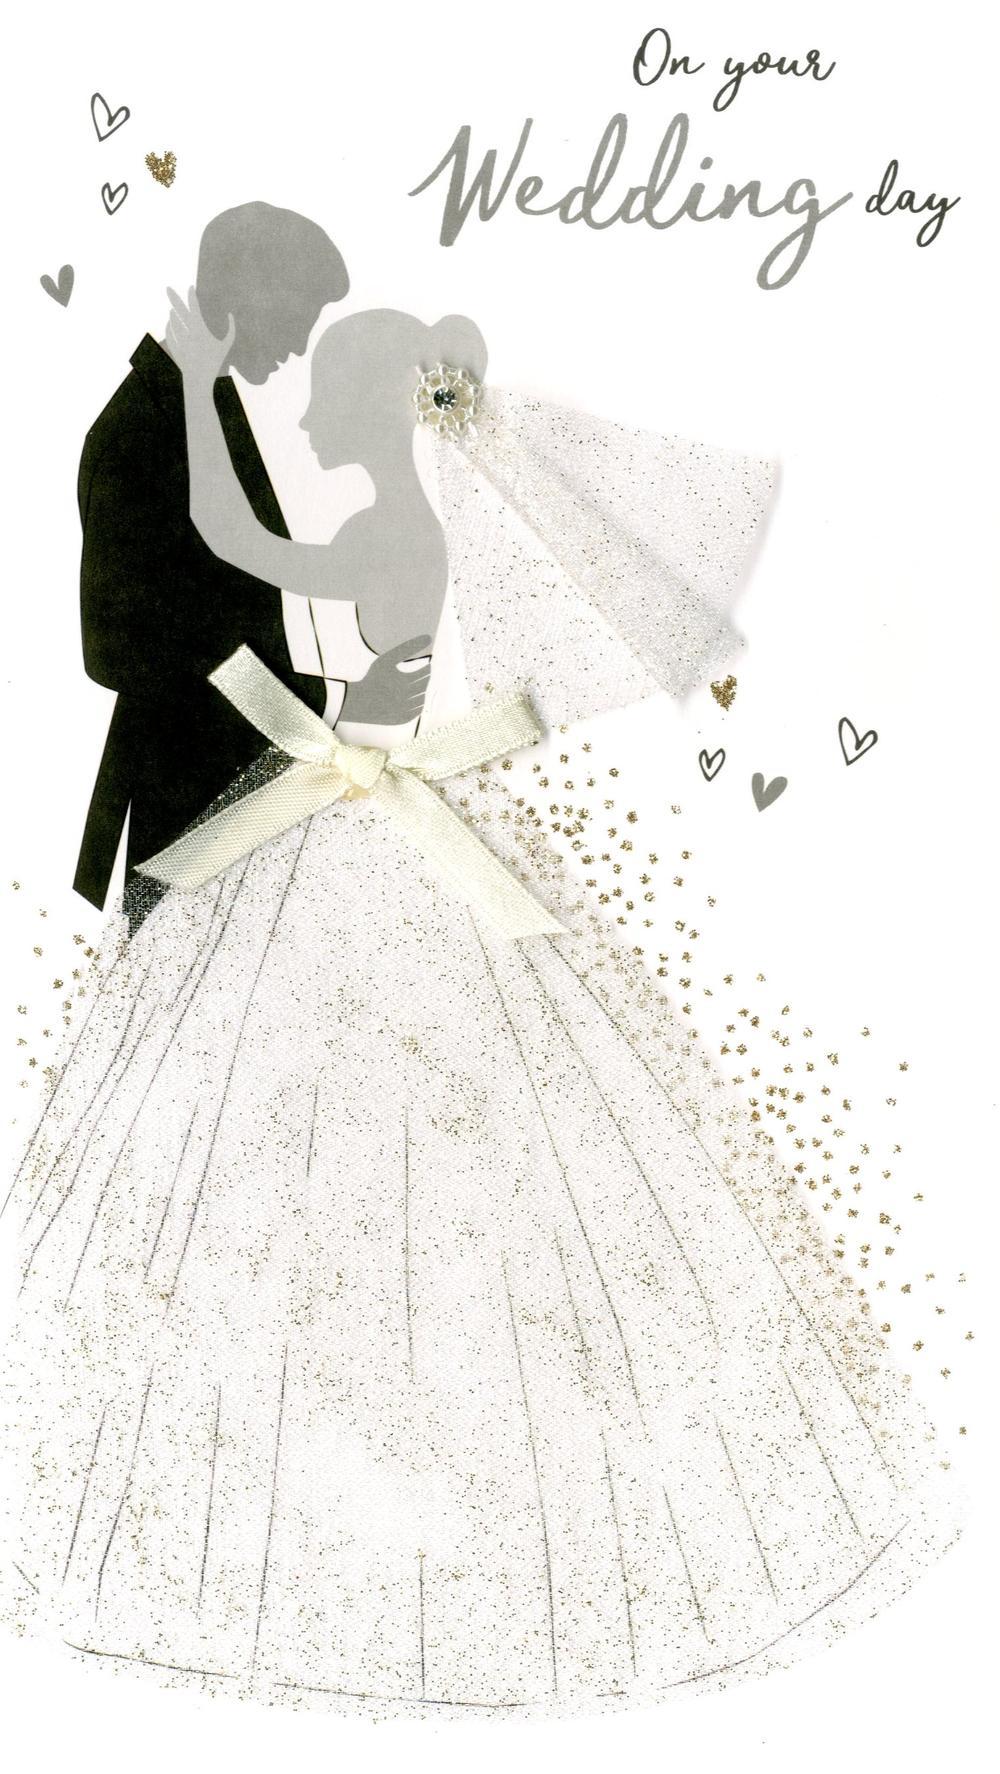 wonderful wedding greeting card handfinished  cards